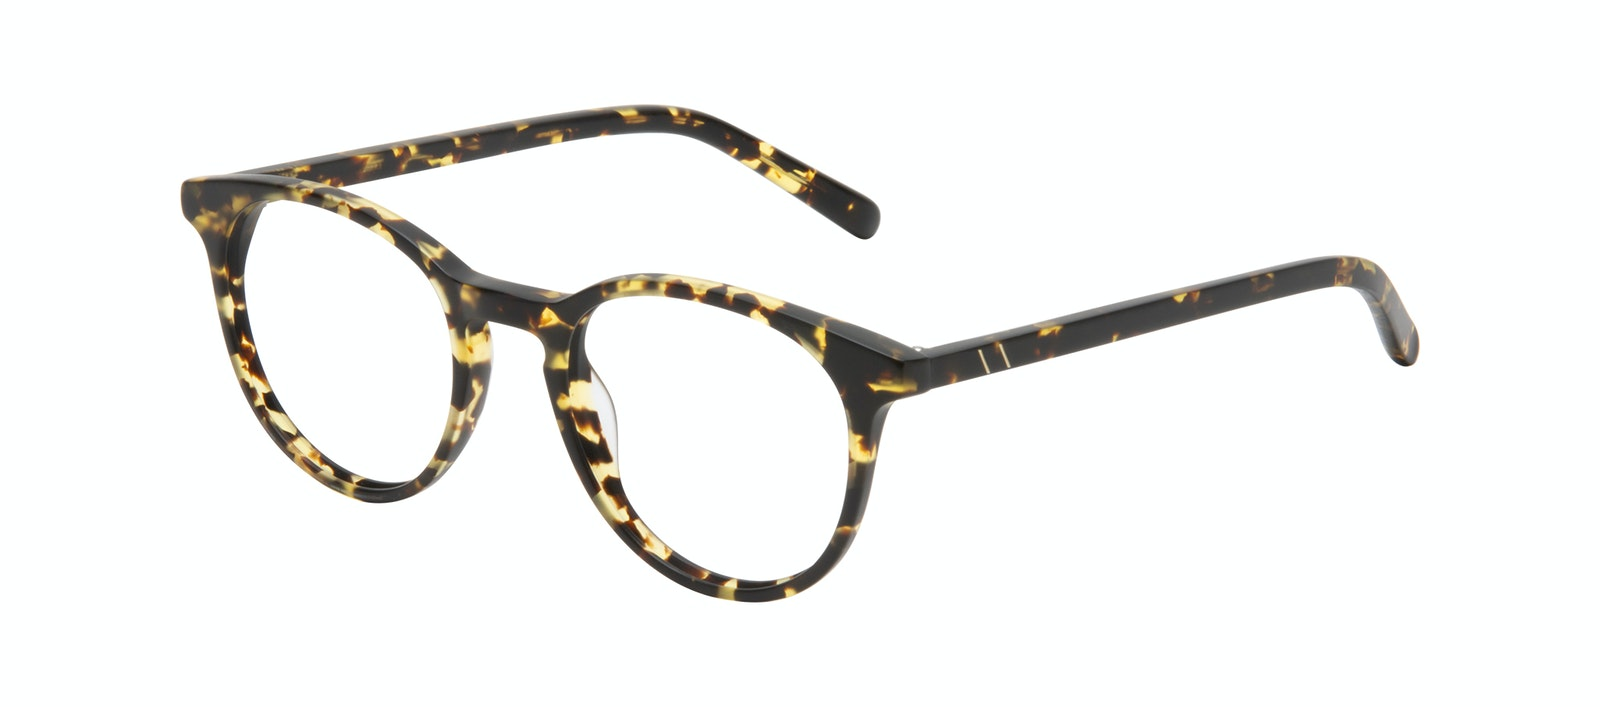 Affordable Fashion Glasses Round Eyeglasses Men Select Tortoise Matte Tilt